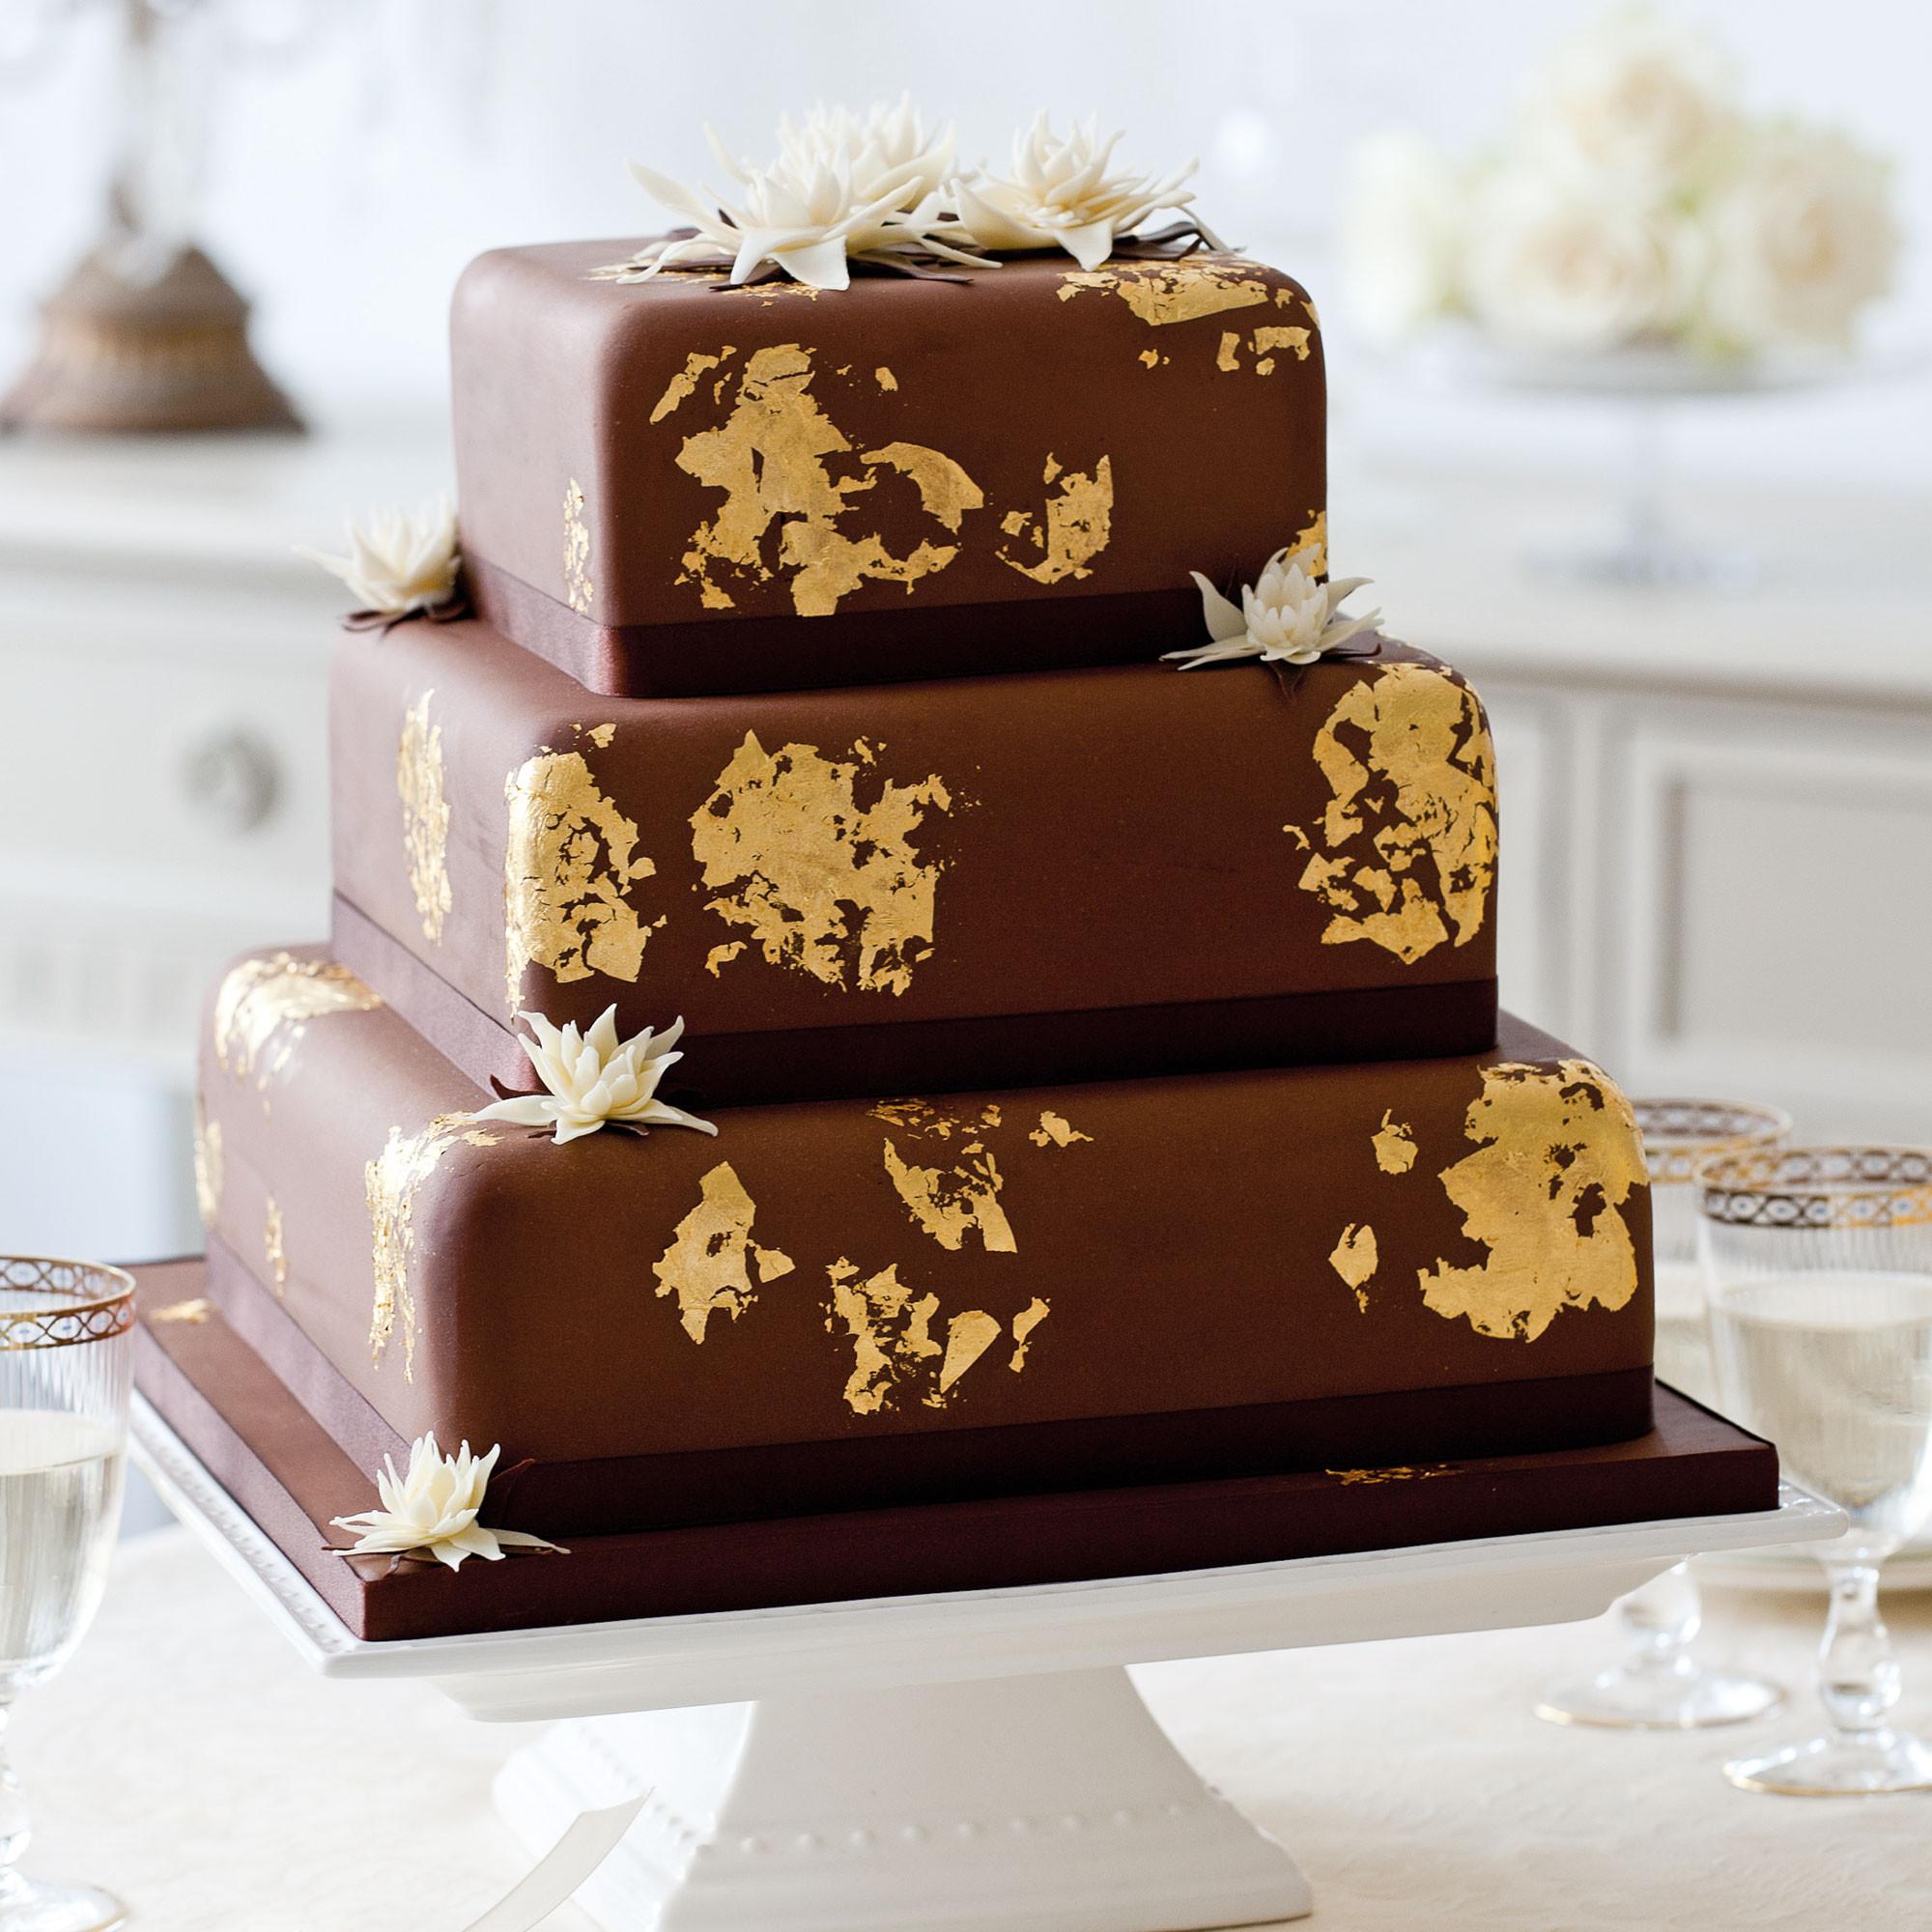 Wedding Cake Recipes  Cake Recipe In urdu Book Ingre nts Easy Ideas s